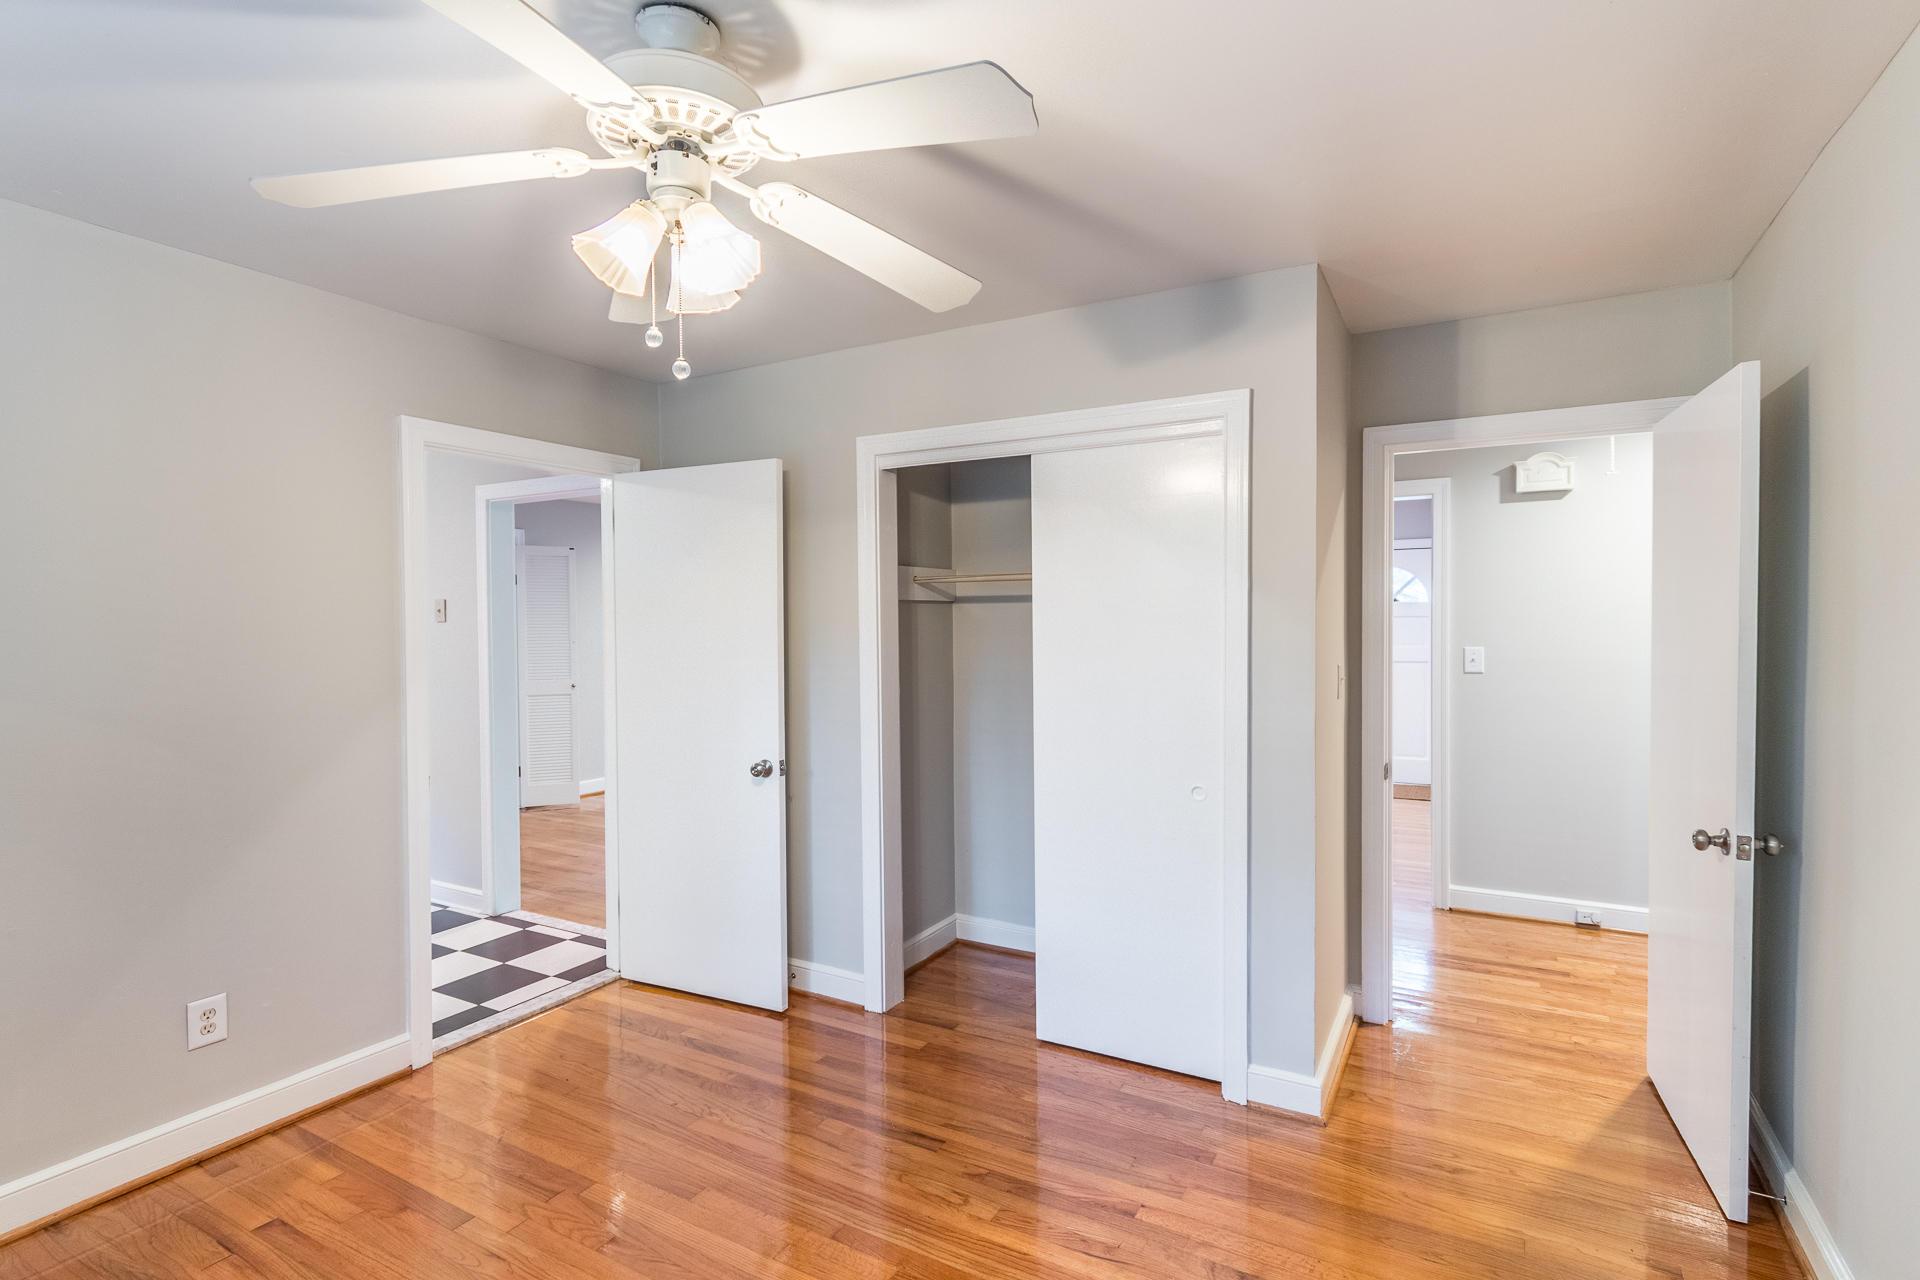 Edgewood Gardens Homes For Sale - 507 Risher, Charleston, SC - 4